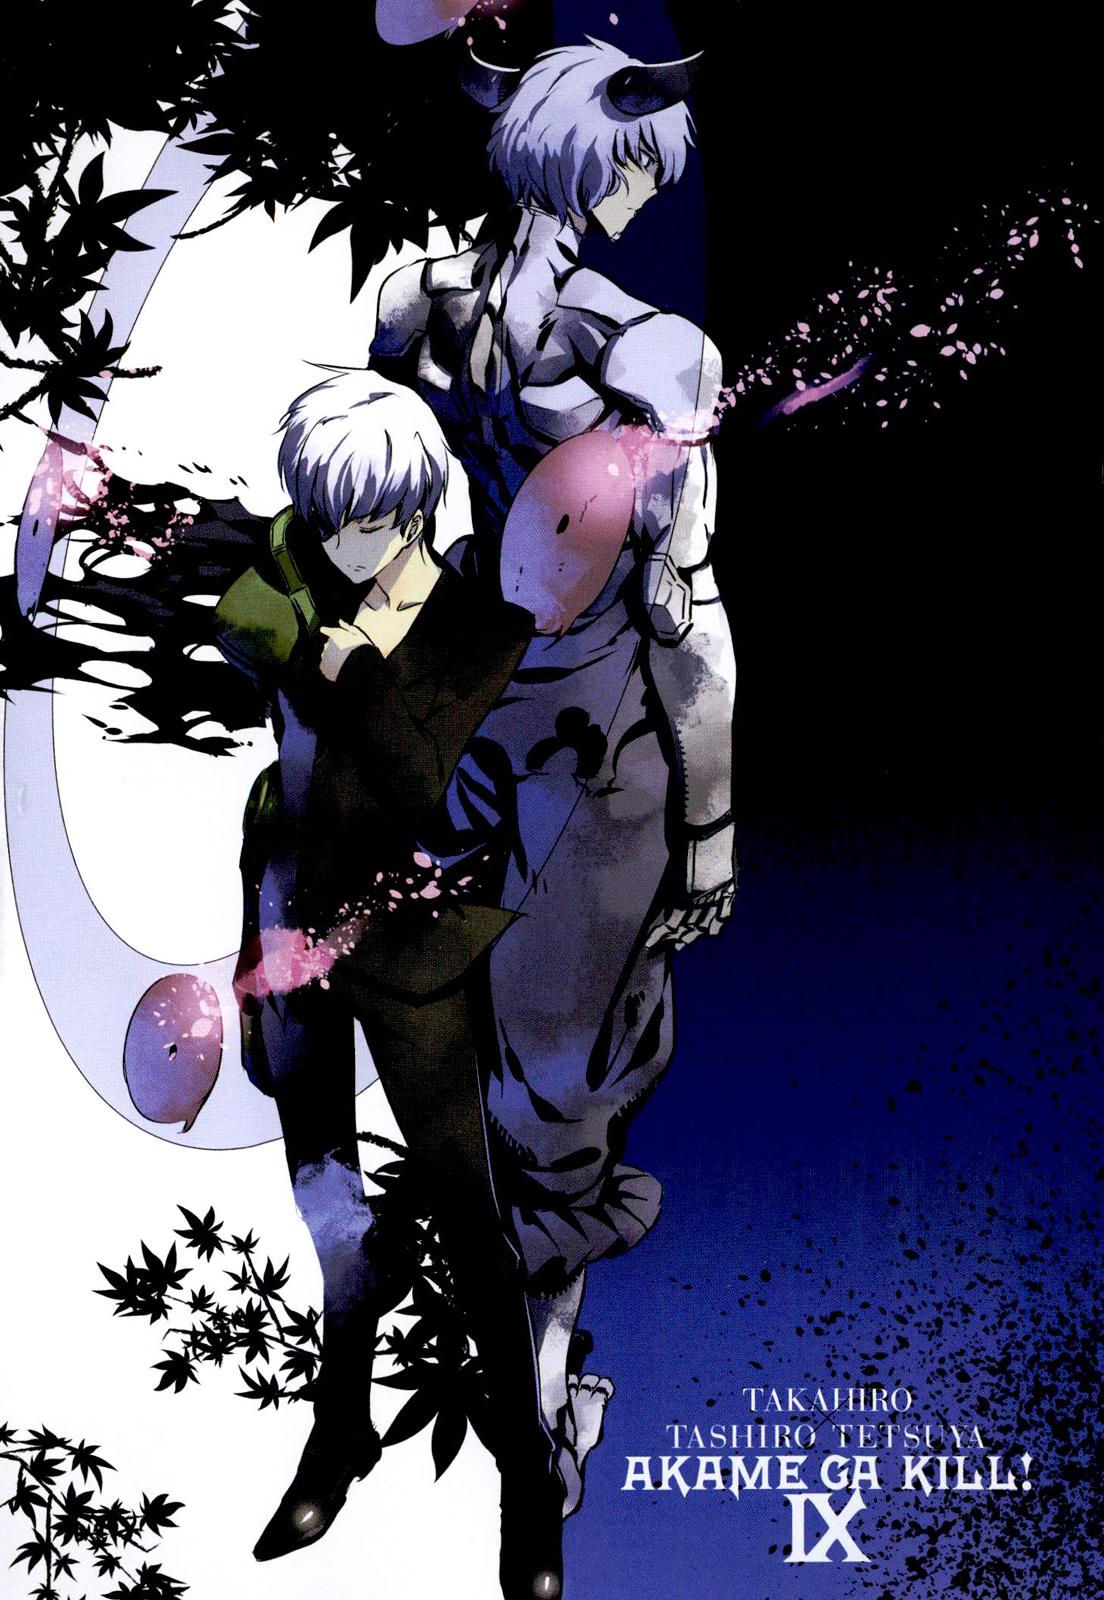 Akame Ga Kill Mobile Wallpaper 1746006 Zerochan Anime Image Board